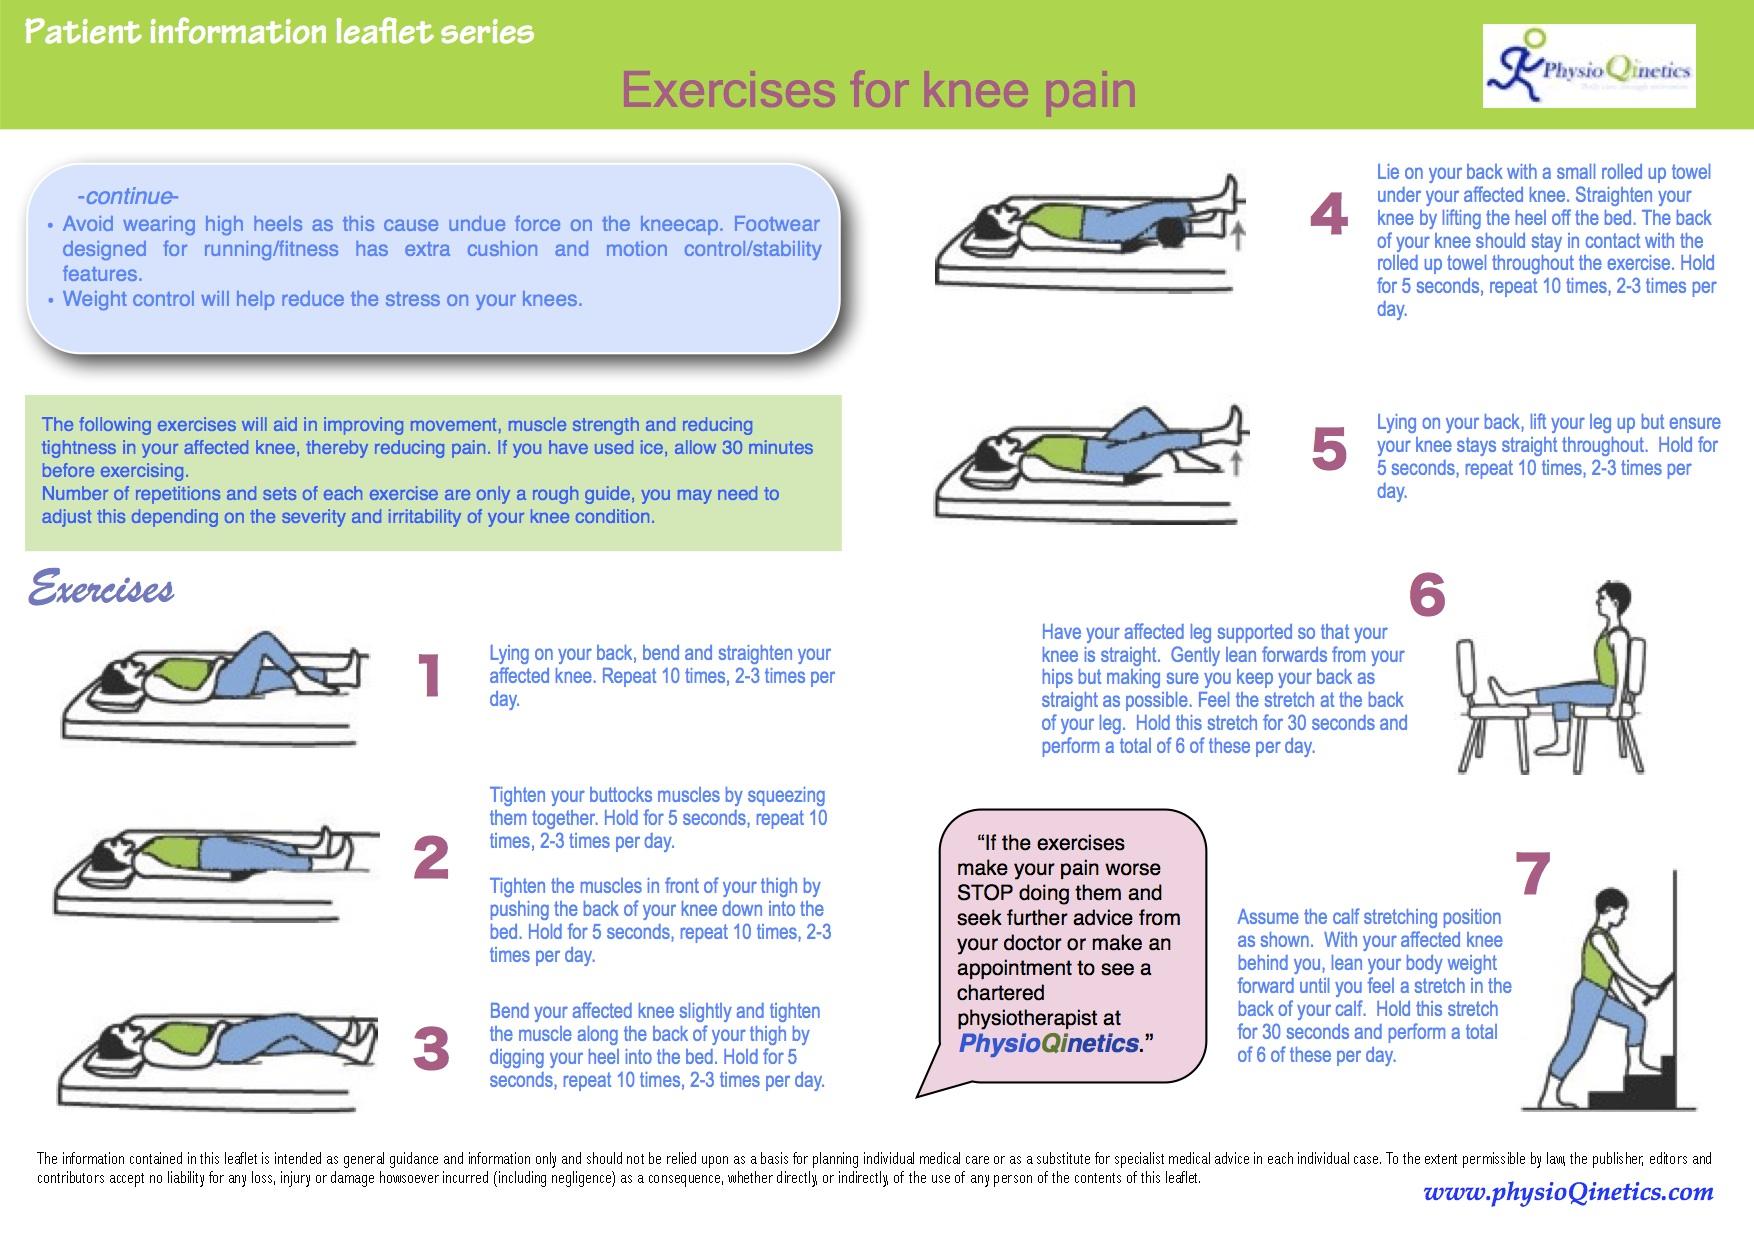 Exercise leaflet for knee pain for knee pain